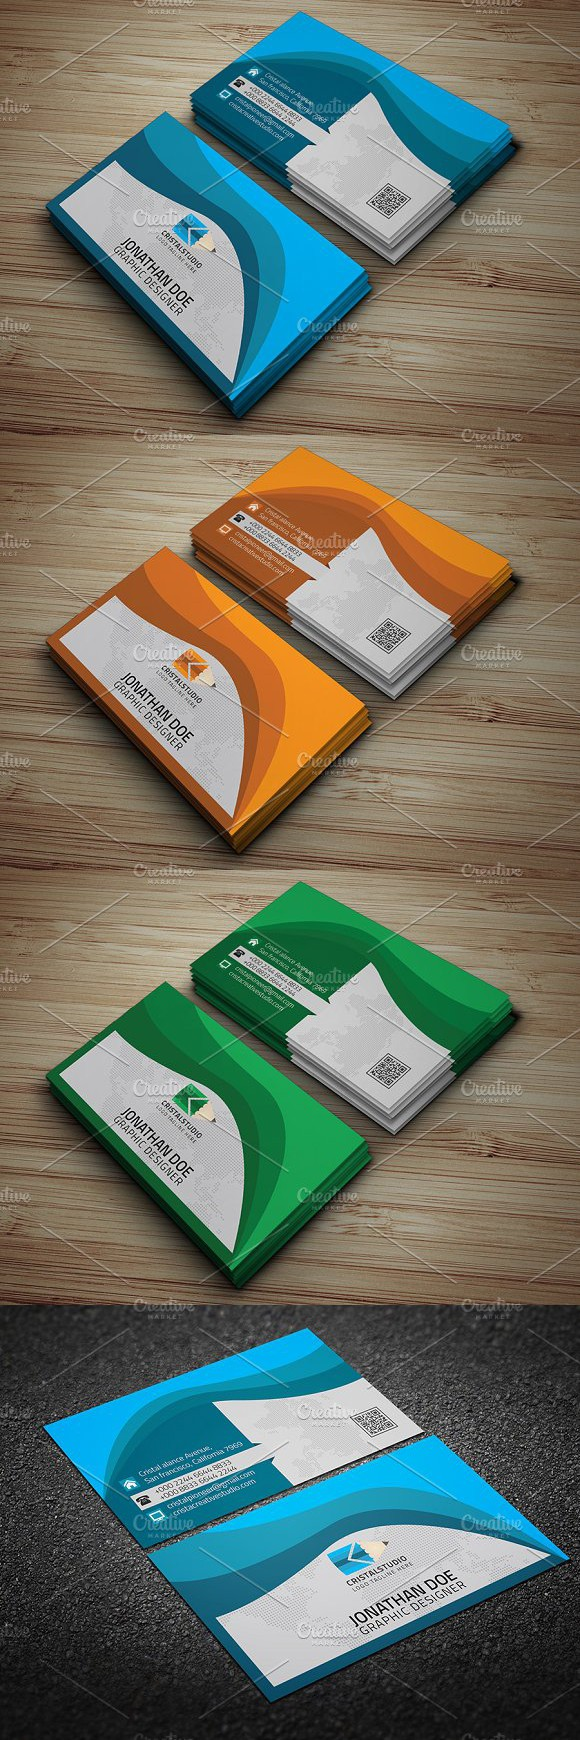 Business Card. Creative Business Card Templates